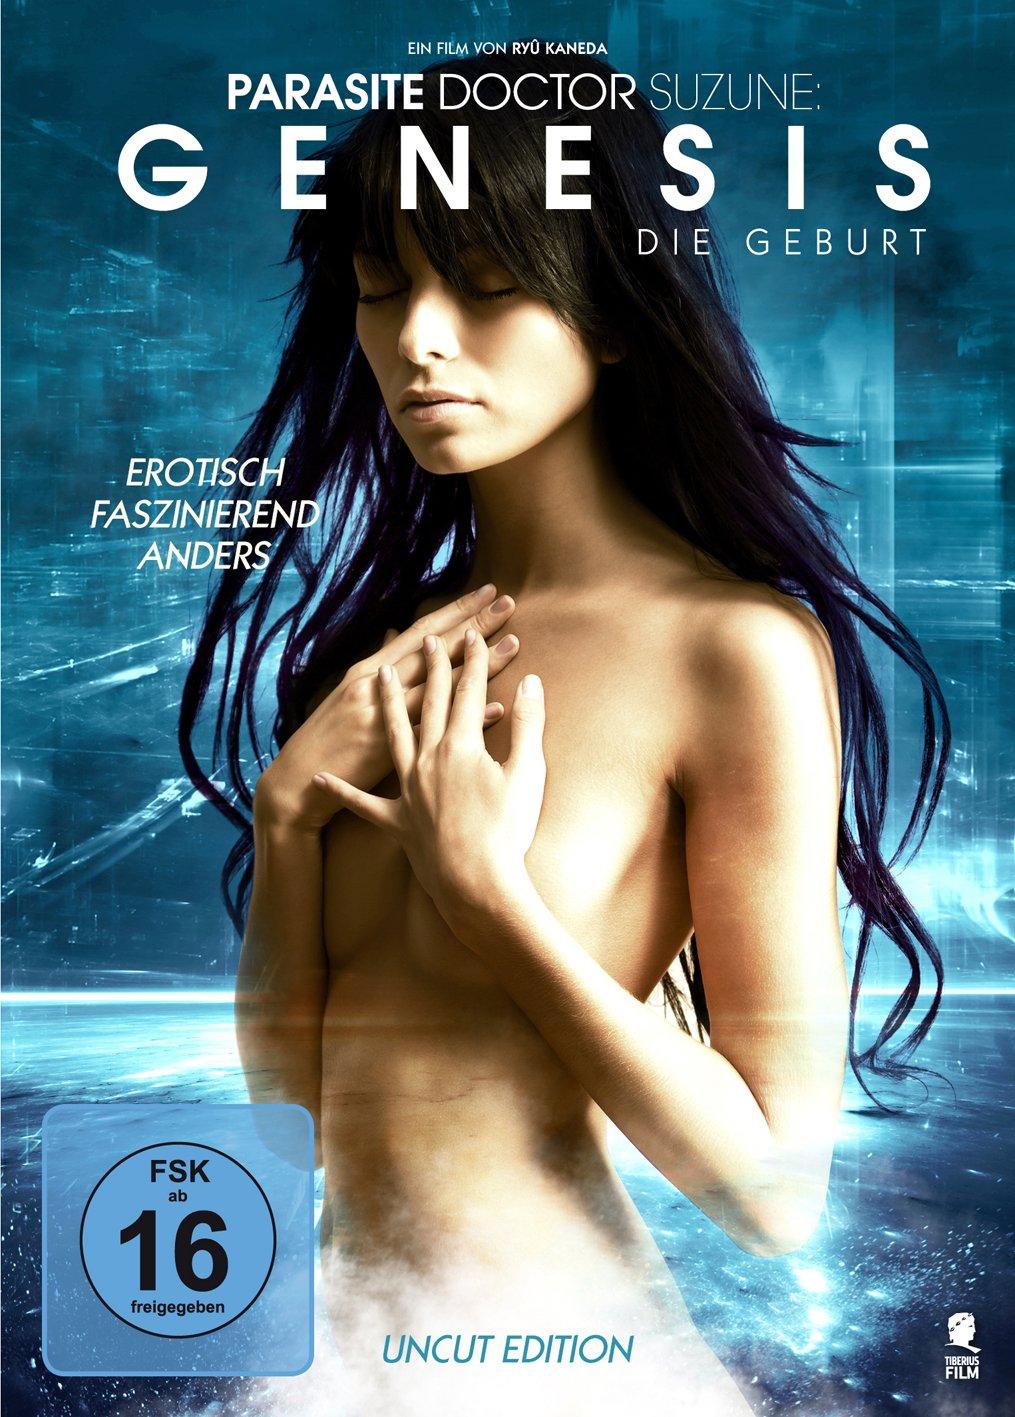 Parasite Doctor Suzune: Genesis - Die Geburt, DVD